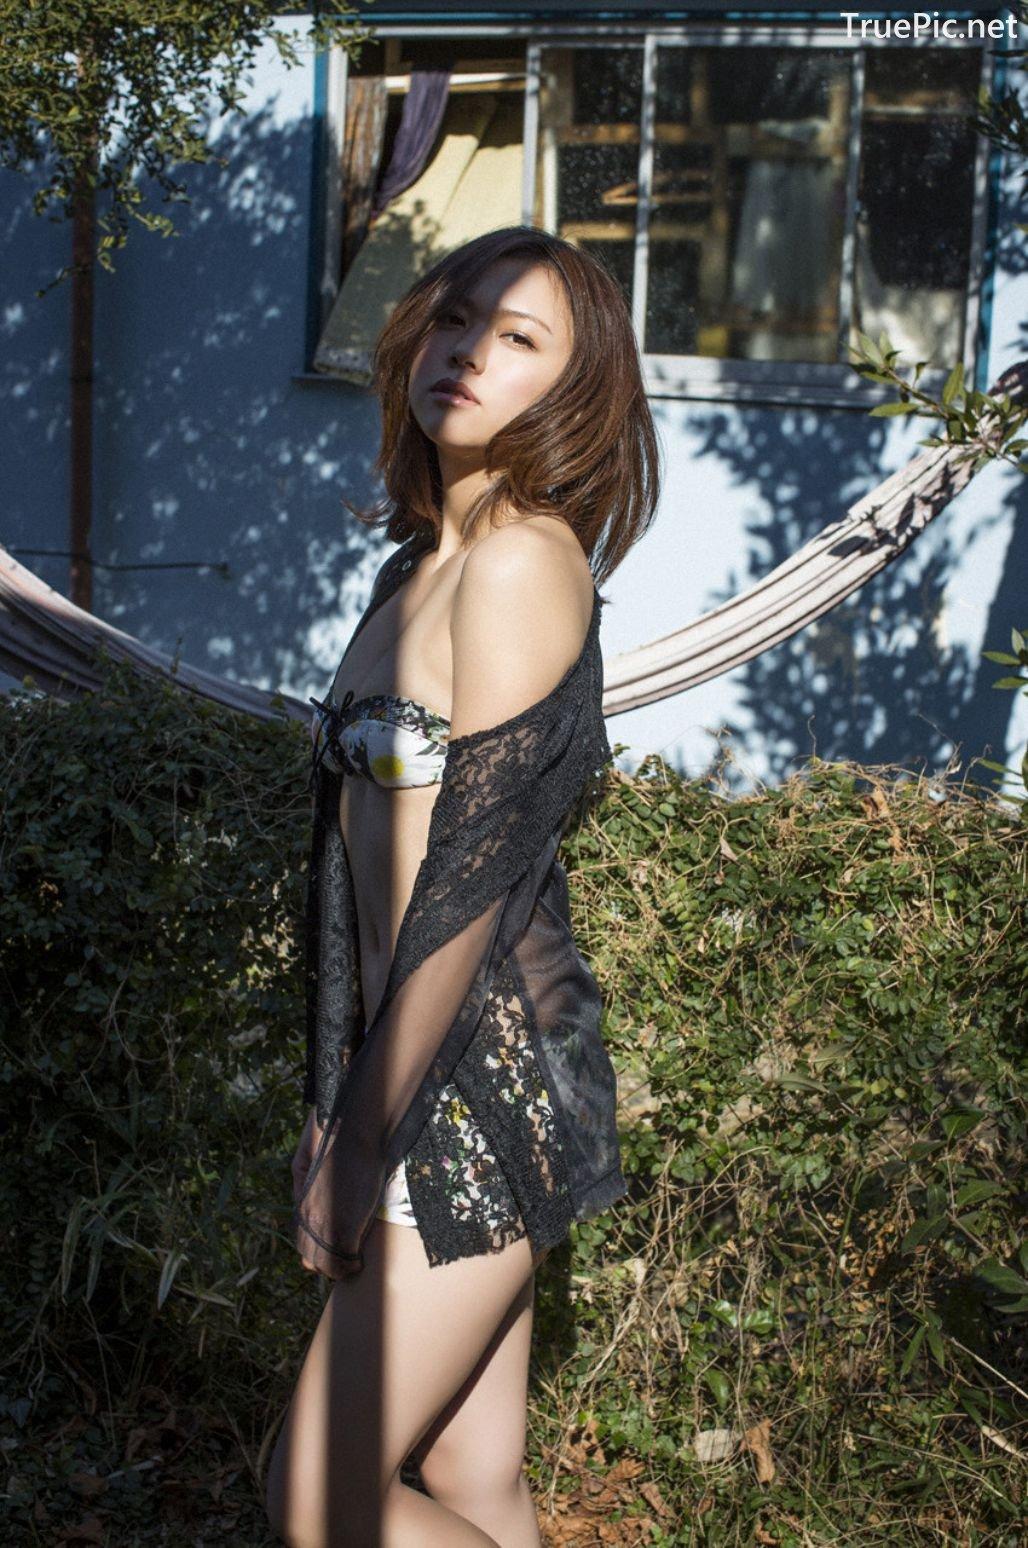 Image-Japanese-Actress-And-Model-Yuka-Konan-Hot-Beauty-Of-Angel-TruePic.net- Picture-1